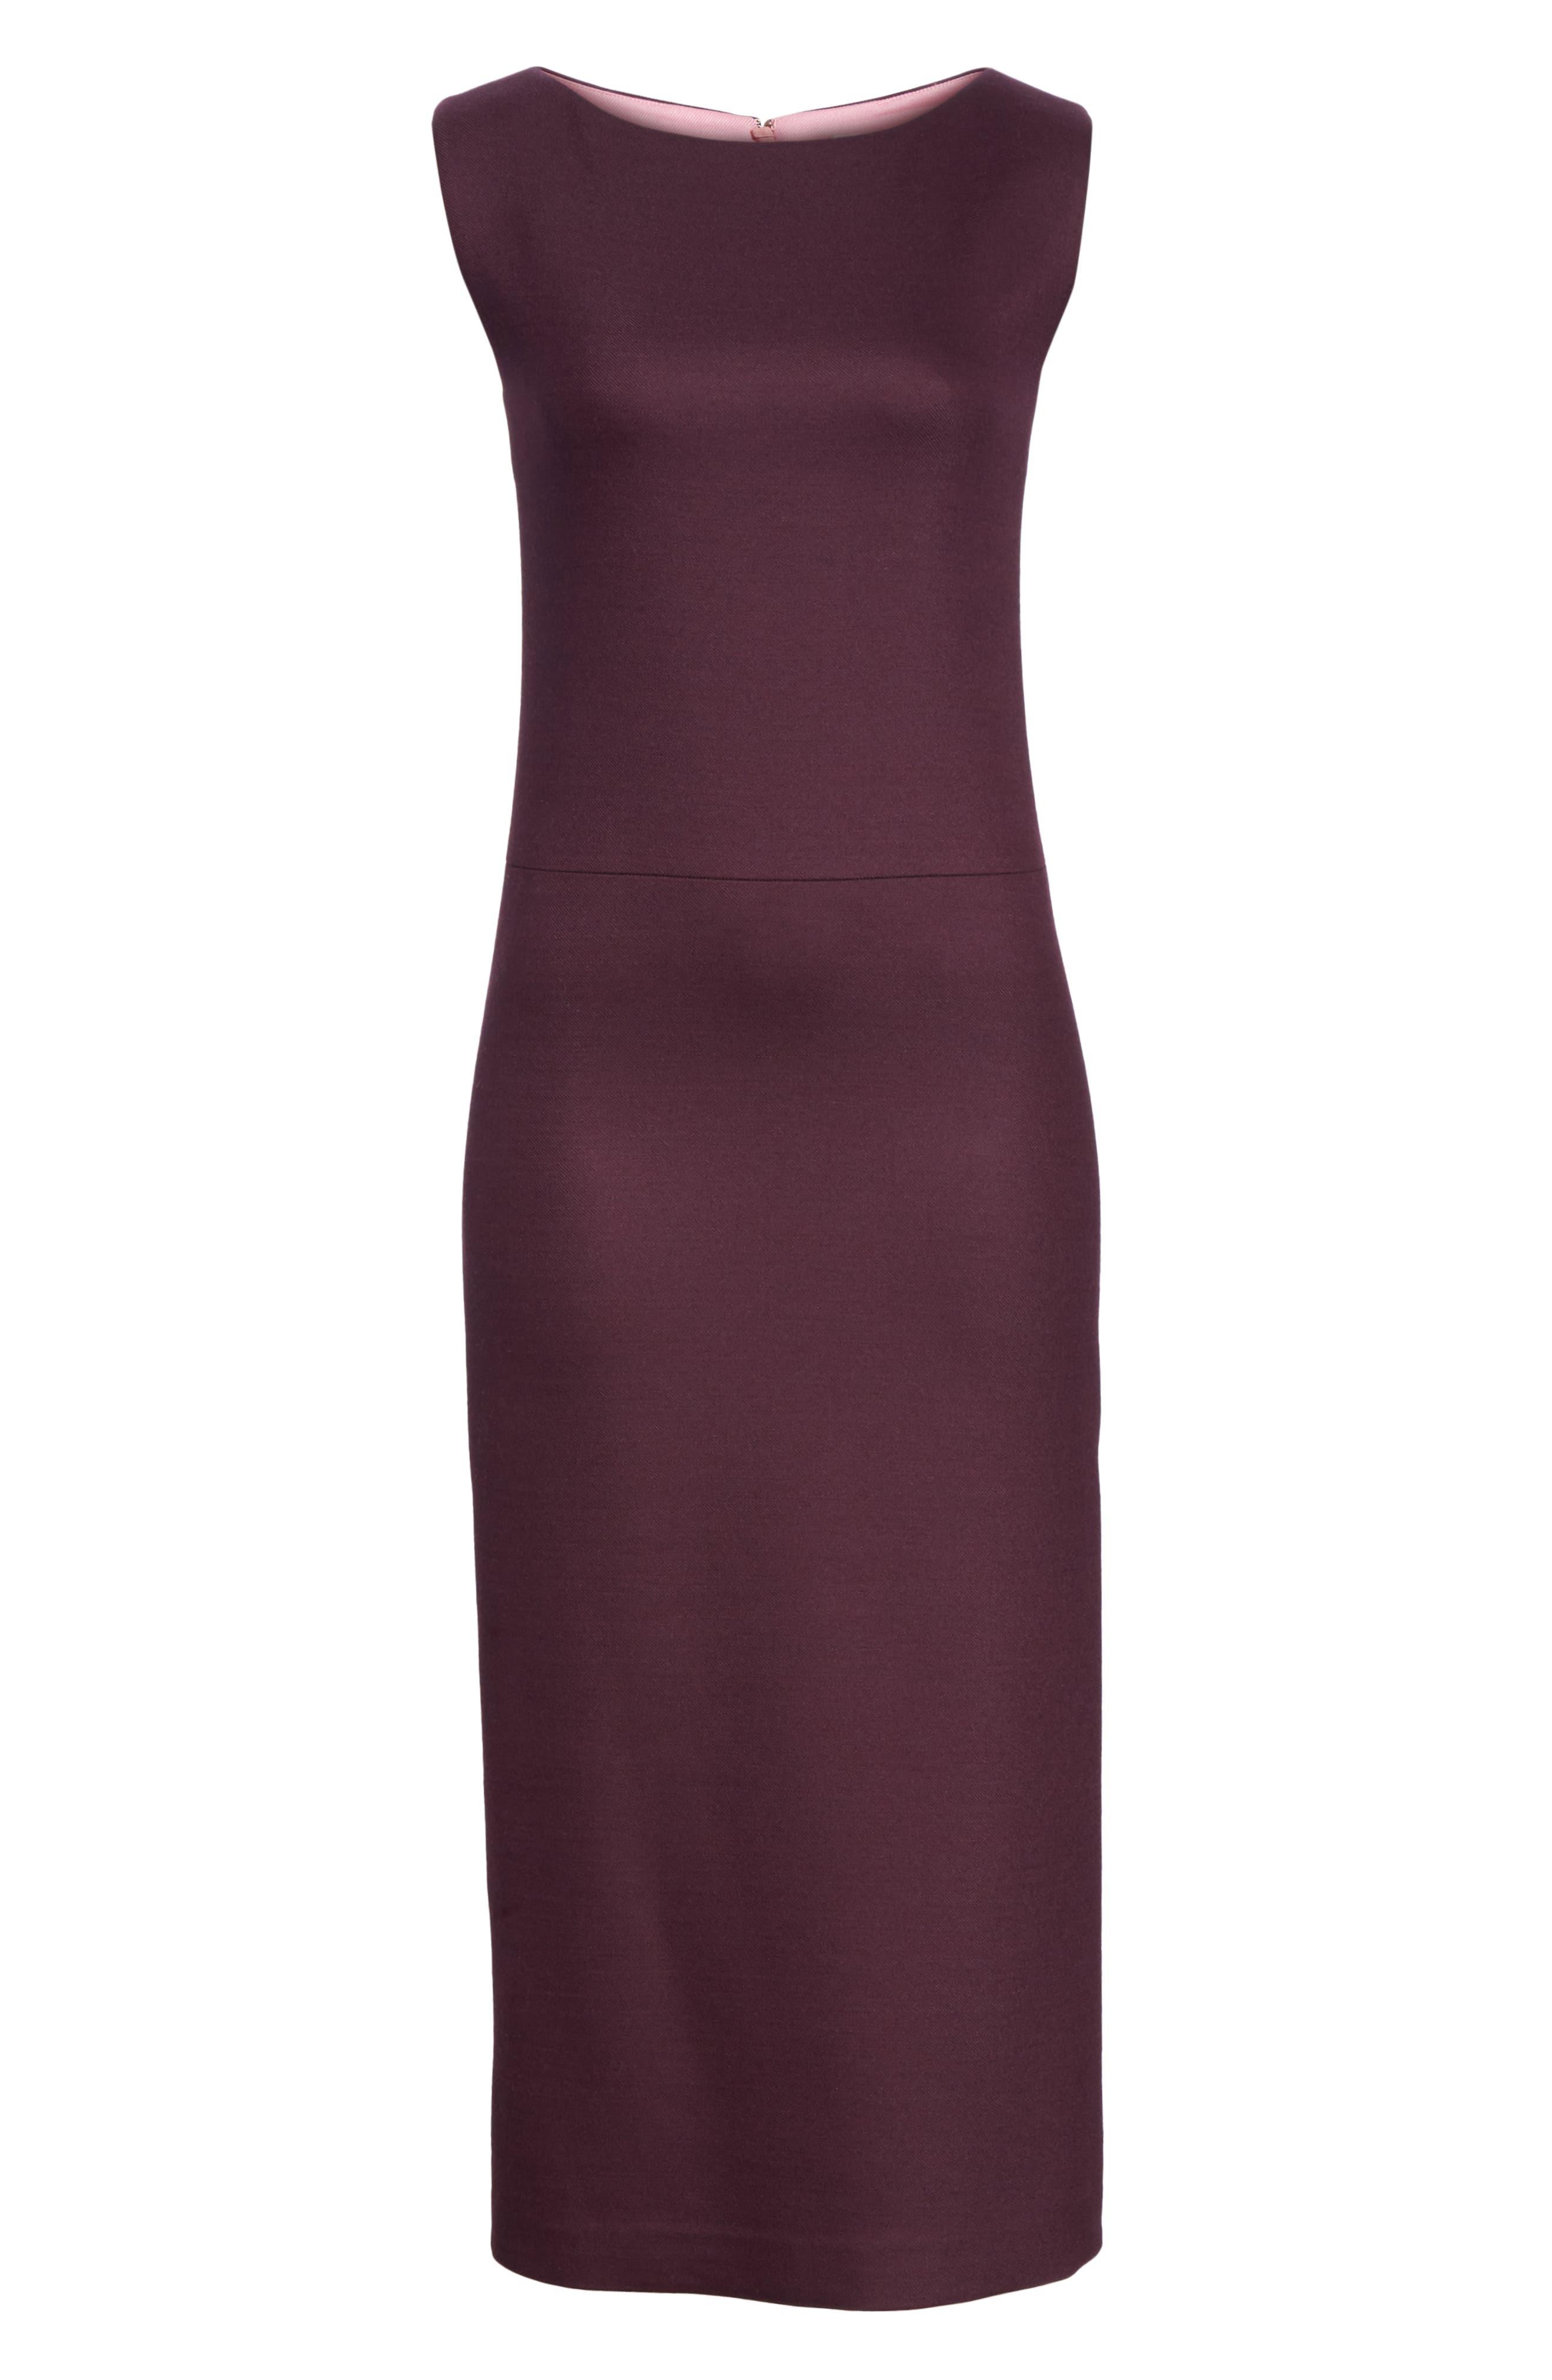 ADAM LIPPES,                             Double Face Wool Sheath Dress,                             Alternate thumbnail 6, color,                             BURGUNDY/ PINK